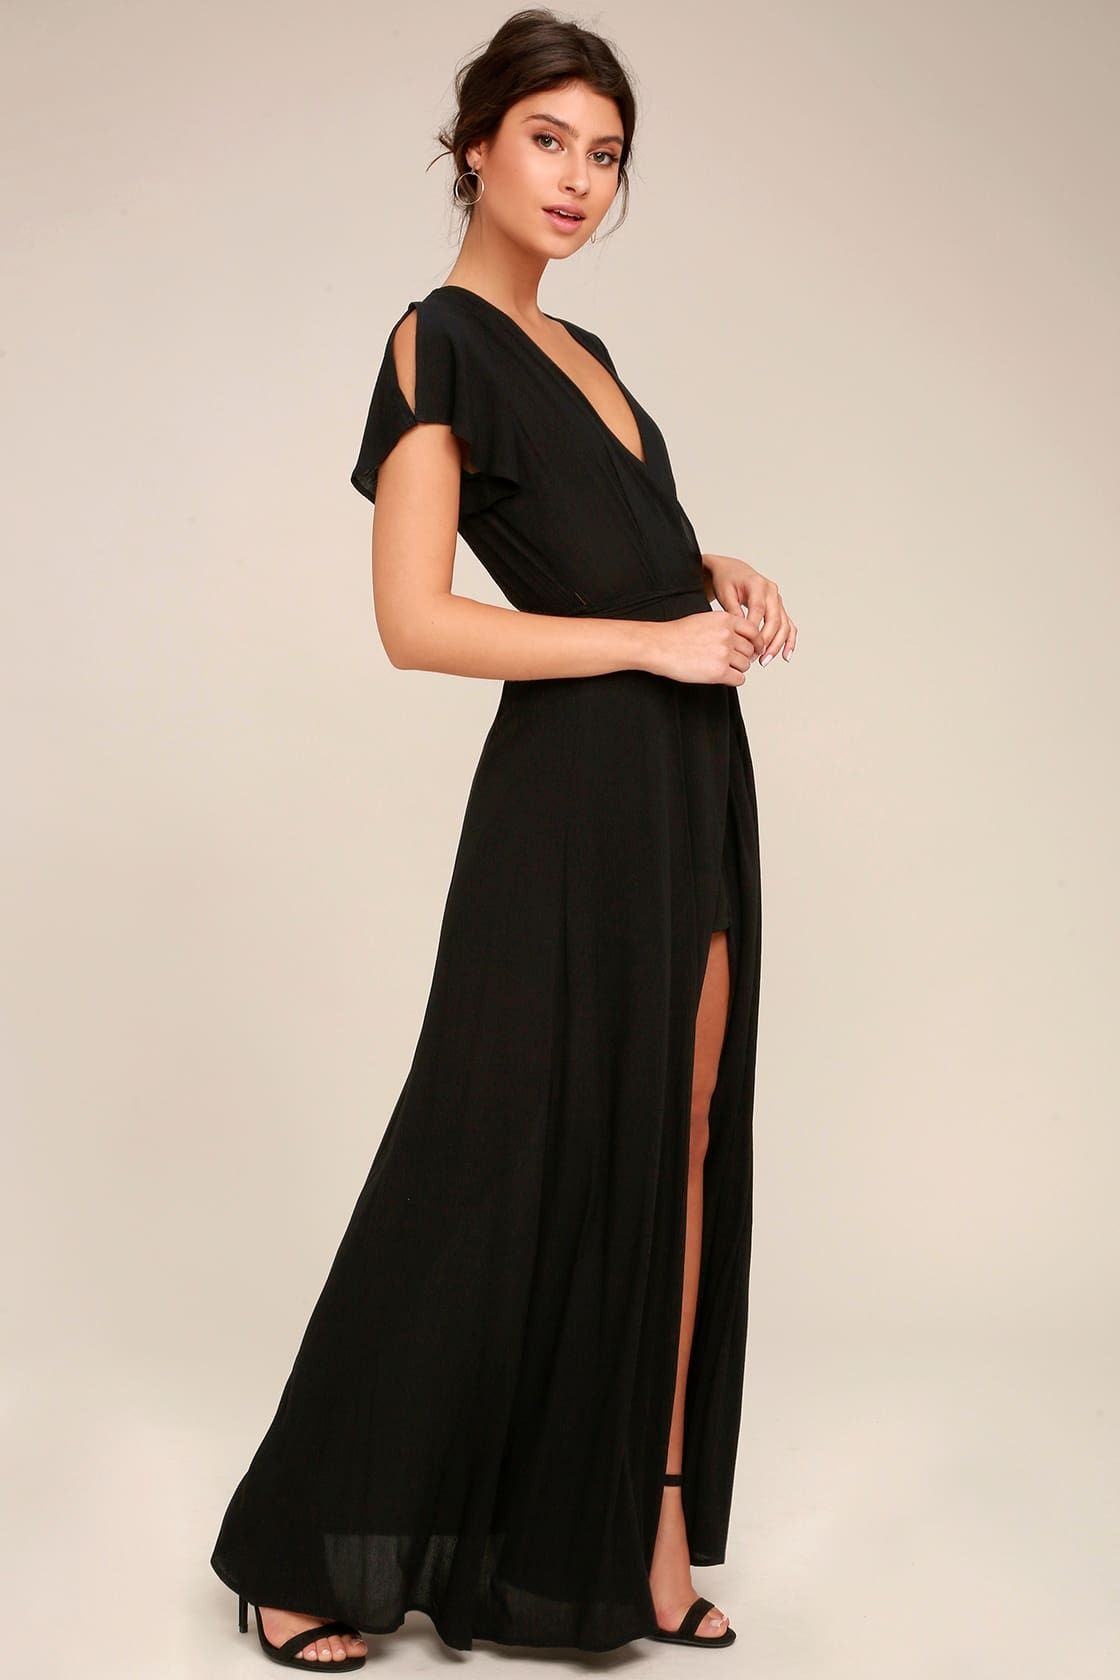 Heart Of Marigold Black Wrap Maxi Dress Stylish Black Dress Maxi Wrap Dress Black Dresses Casual [ 1680 x 1120 Pixel ]